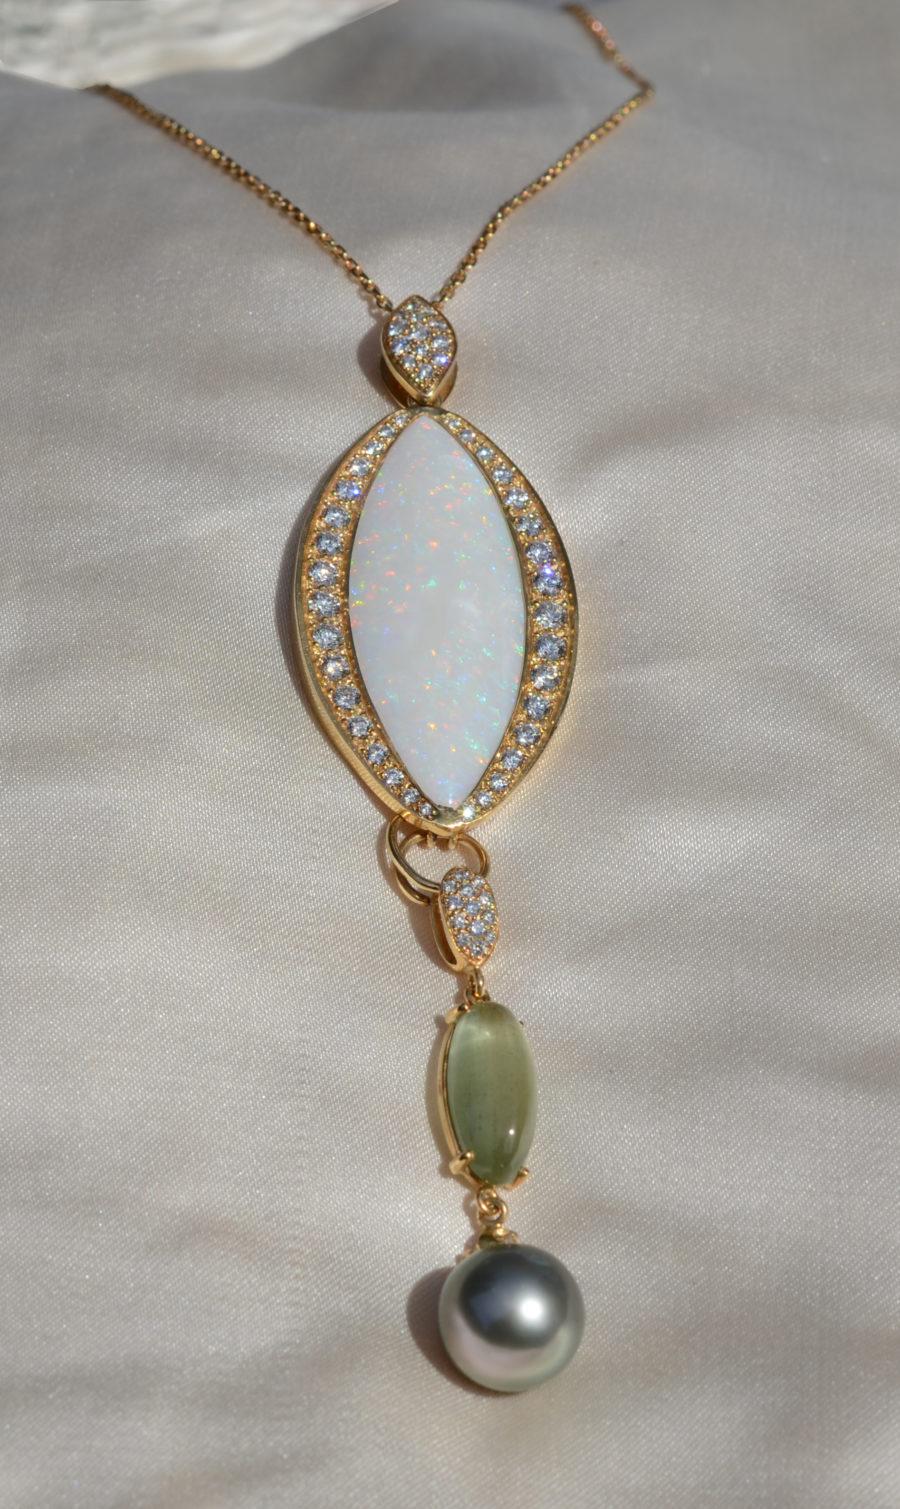 Pendentif, Opale de 24 carats, Béryl vert, Perle grise de Tahiti, Diamants